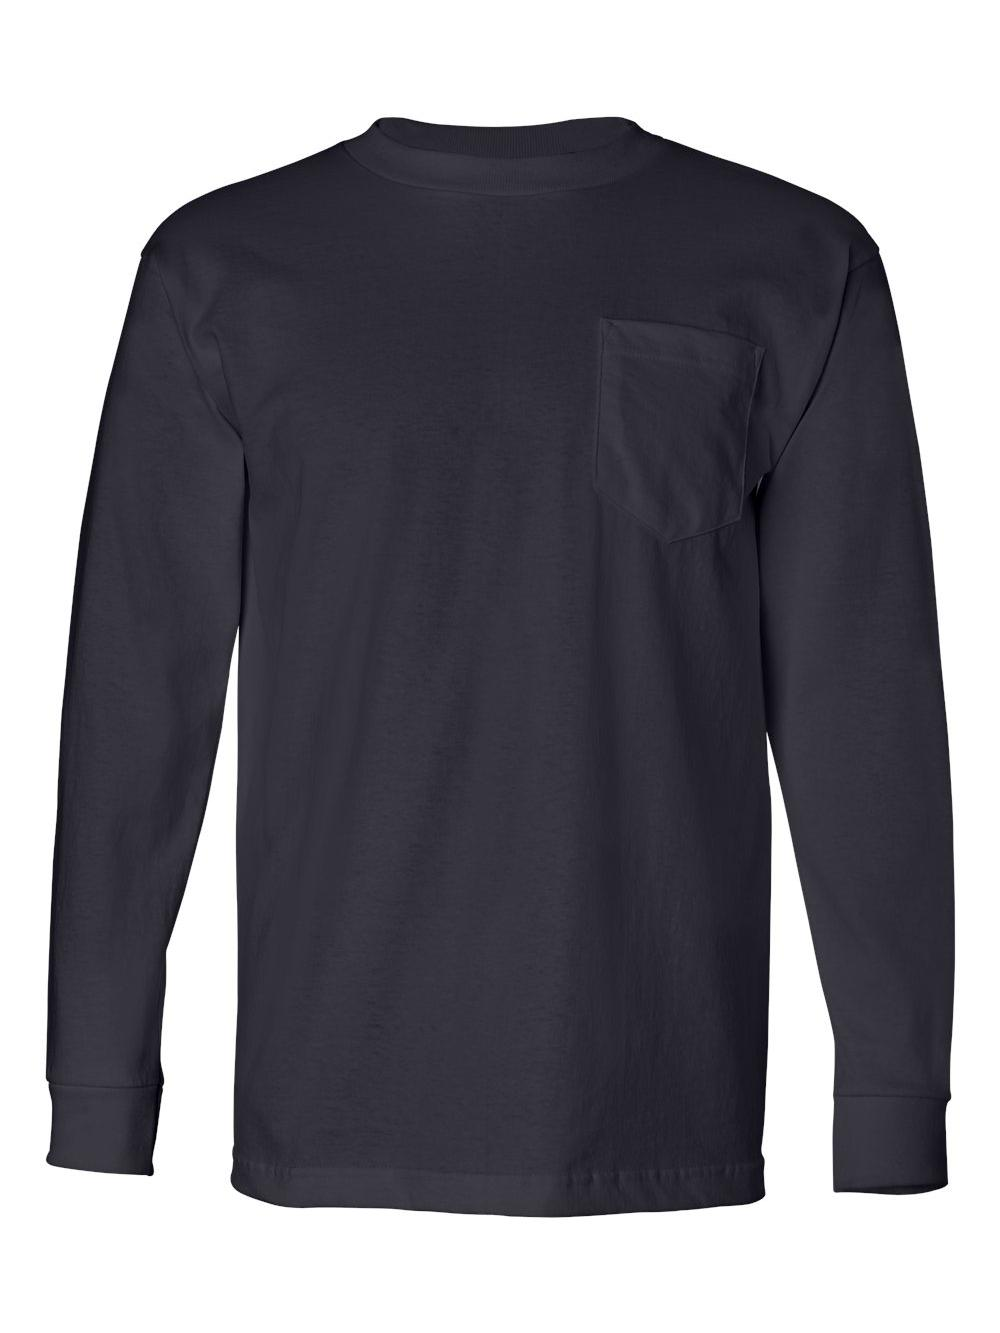 Bayside-USA-Made-Long-Sleeve-T-Shirt-with-a-Pocket-8100 thumbnail 15